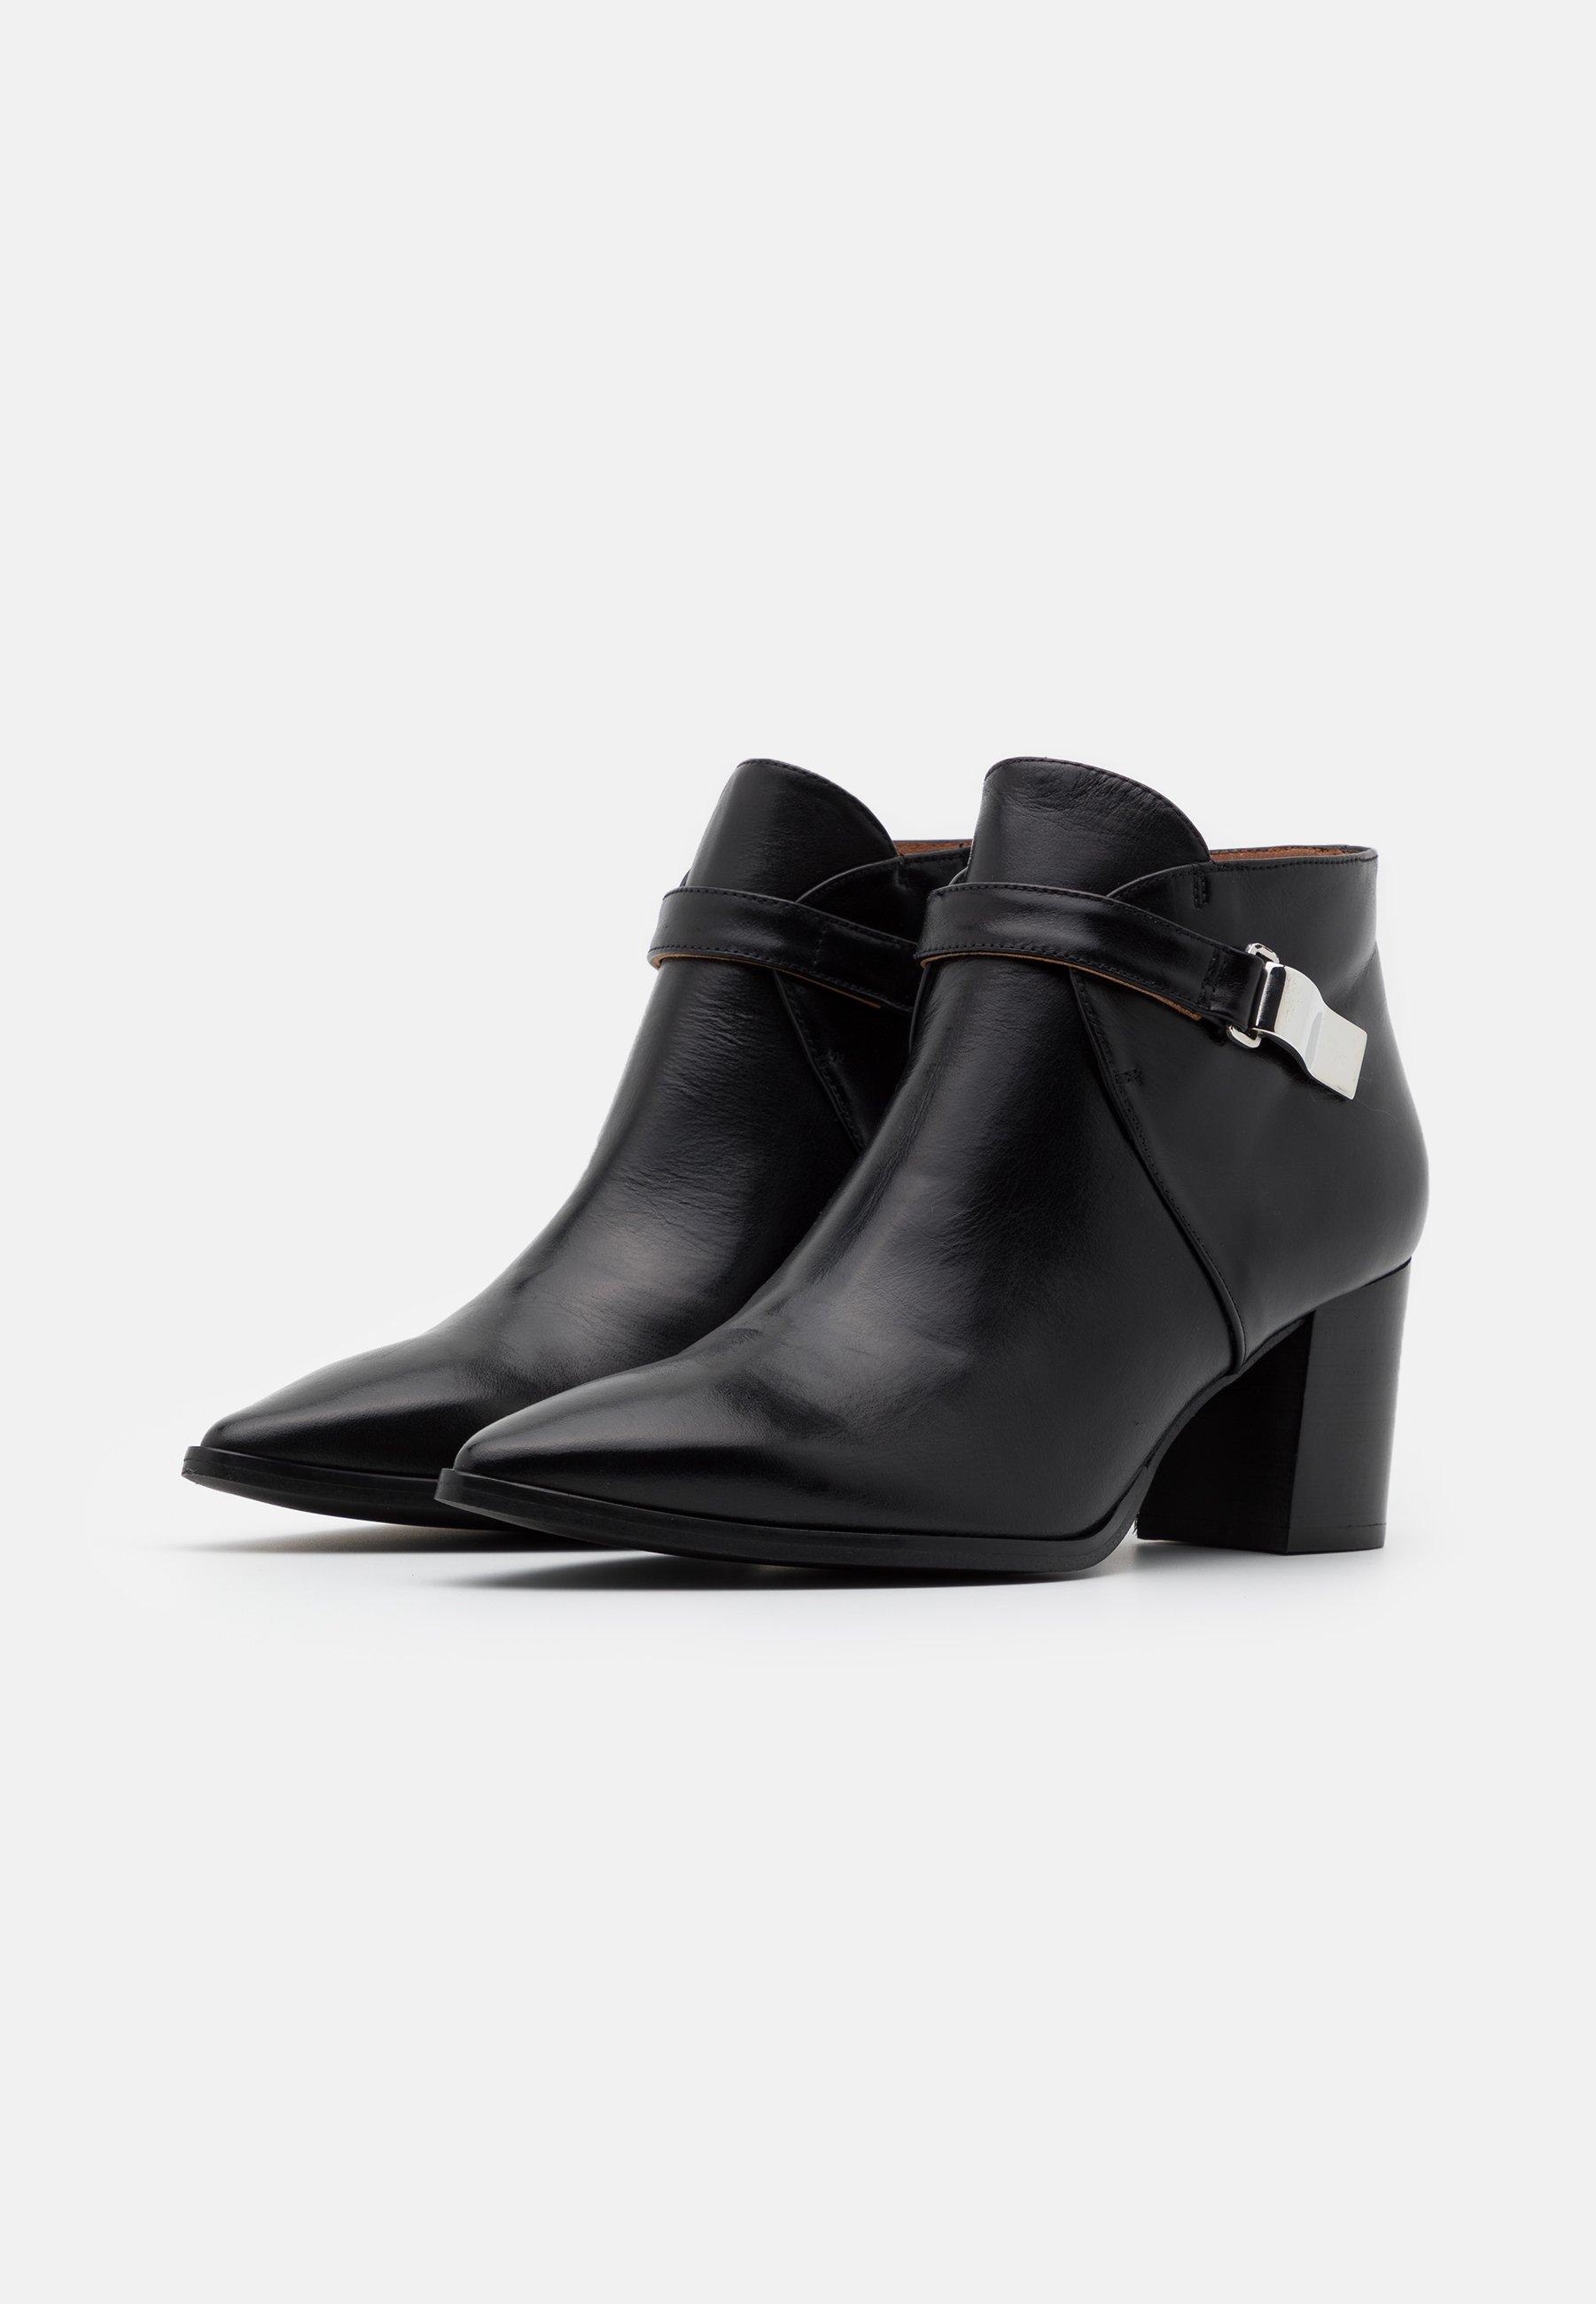 Les mieux notés Meilleurs prix Brenda Zaro BENETTBO Boots à talons black CMxIY